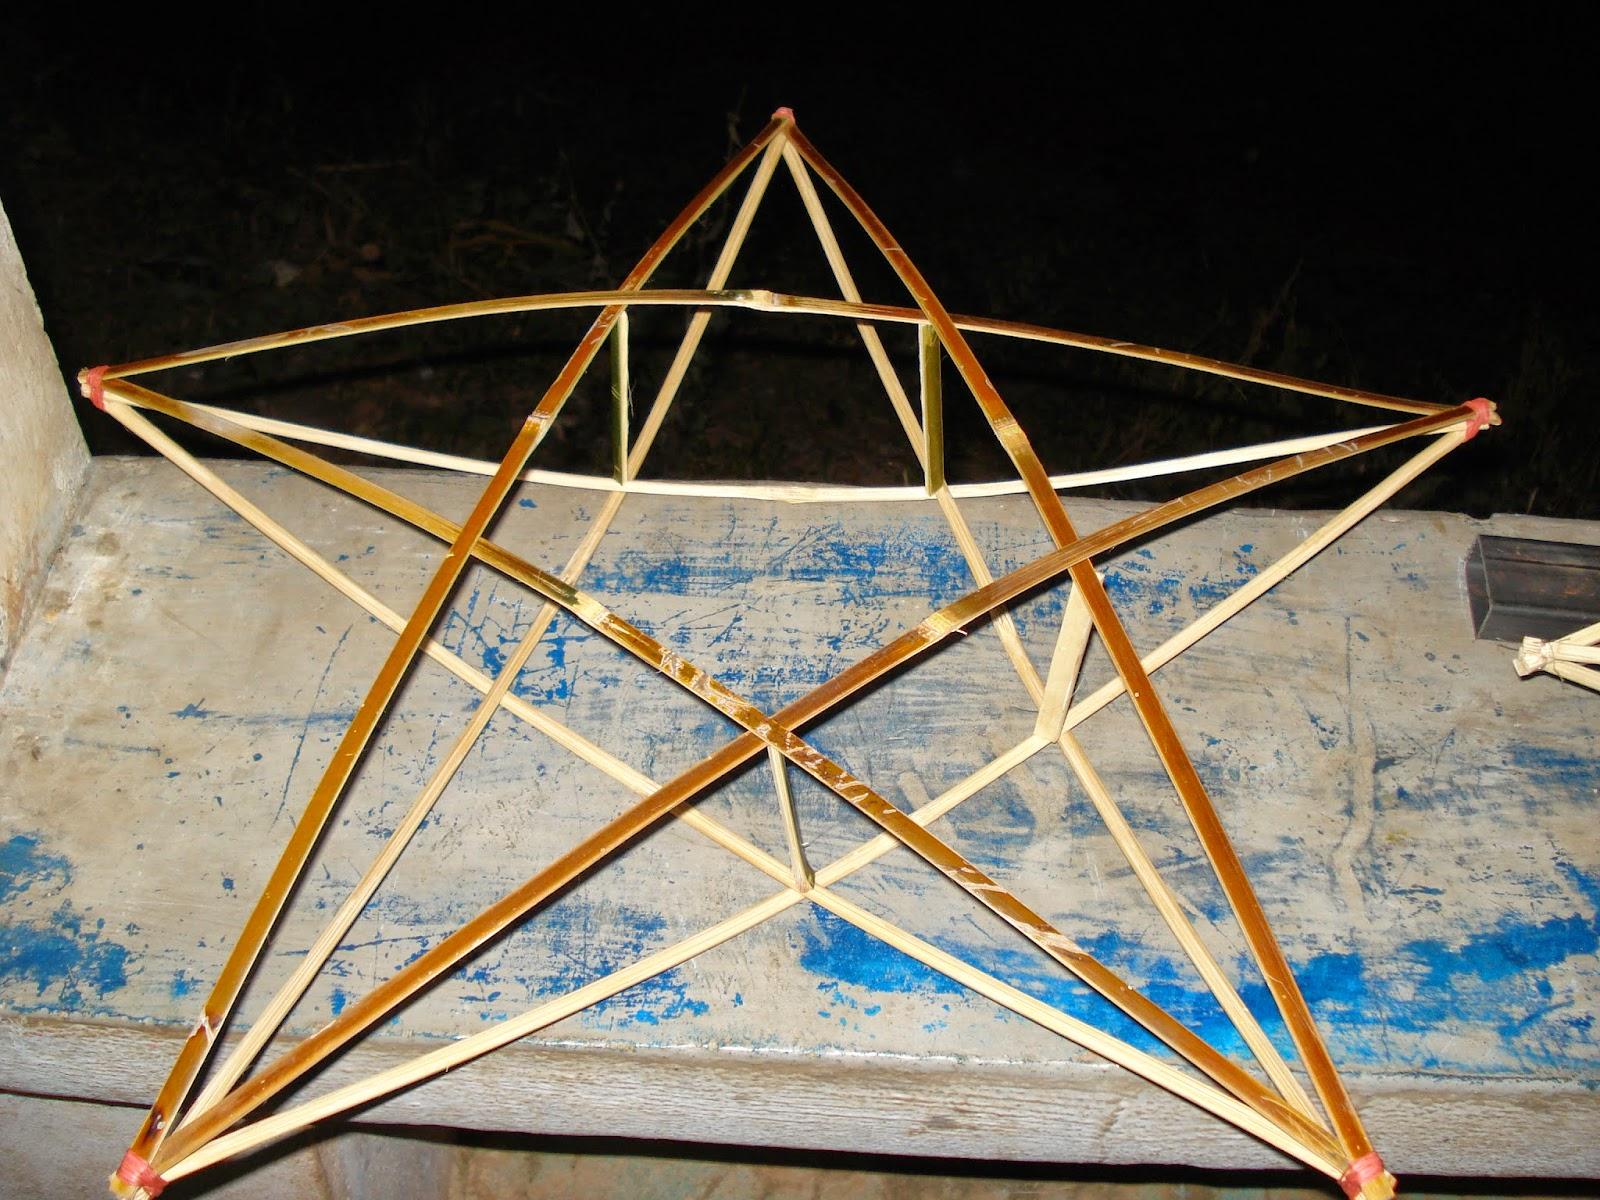 Chasis de la estrella